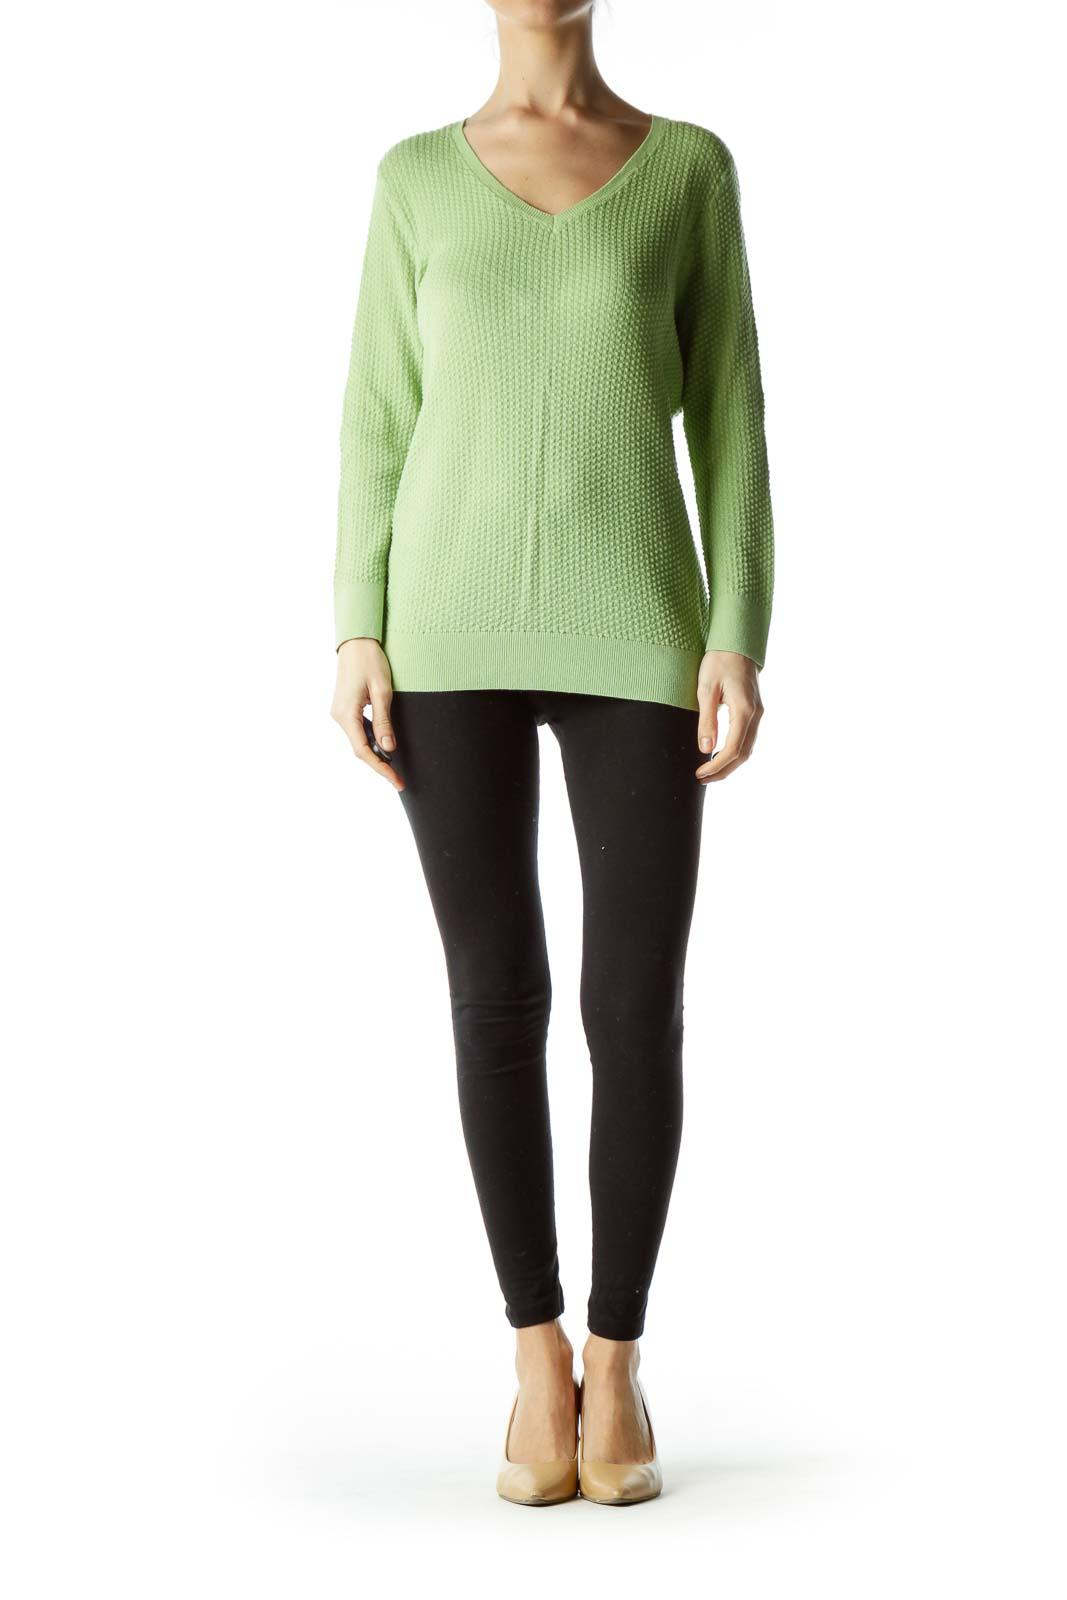 Green Textured Knit Top